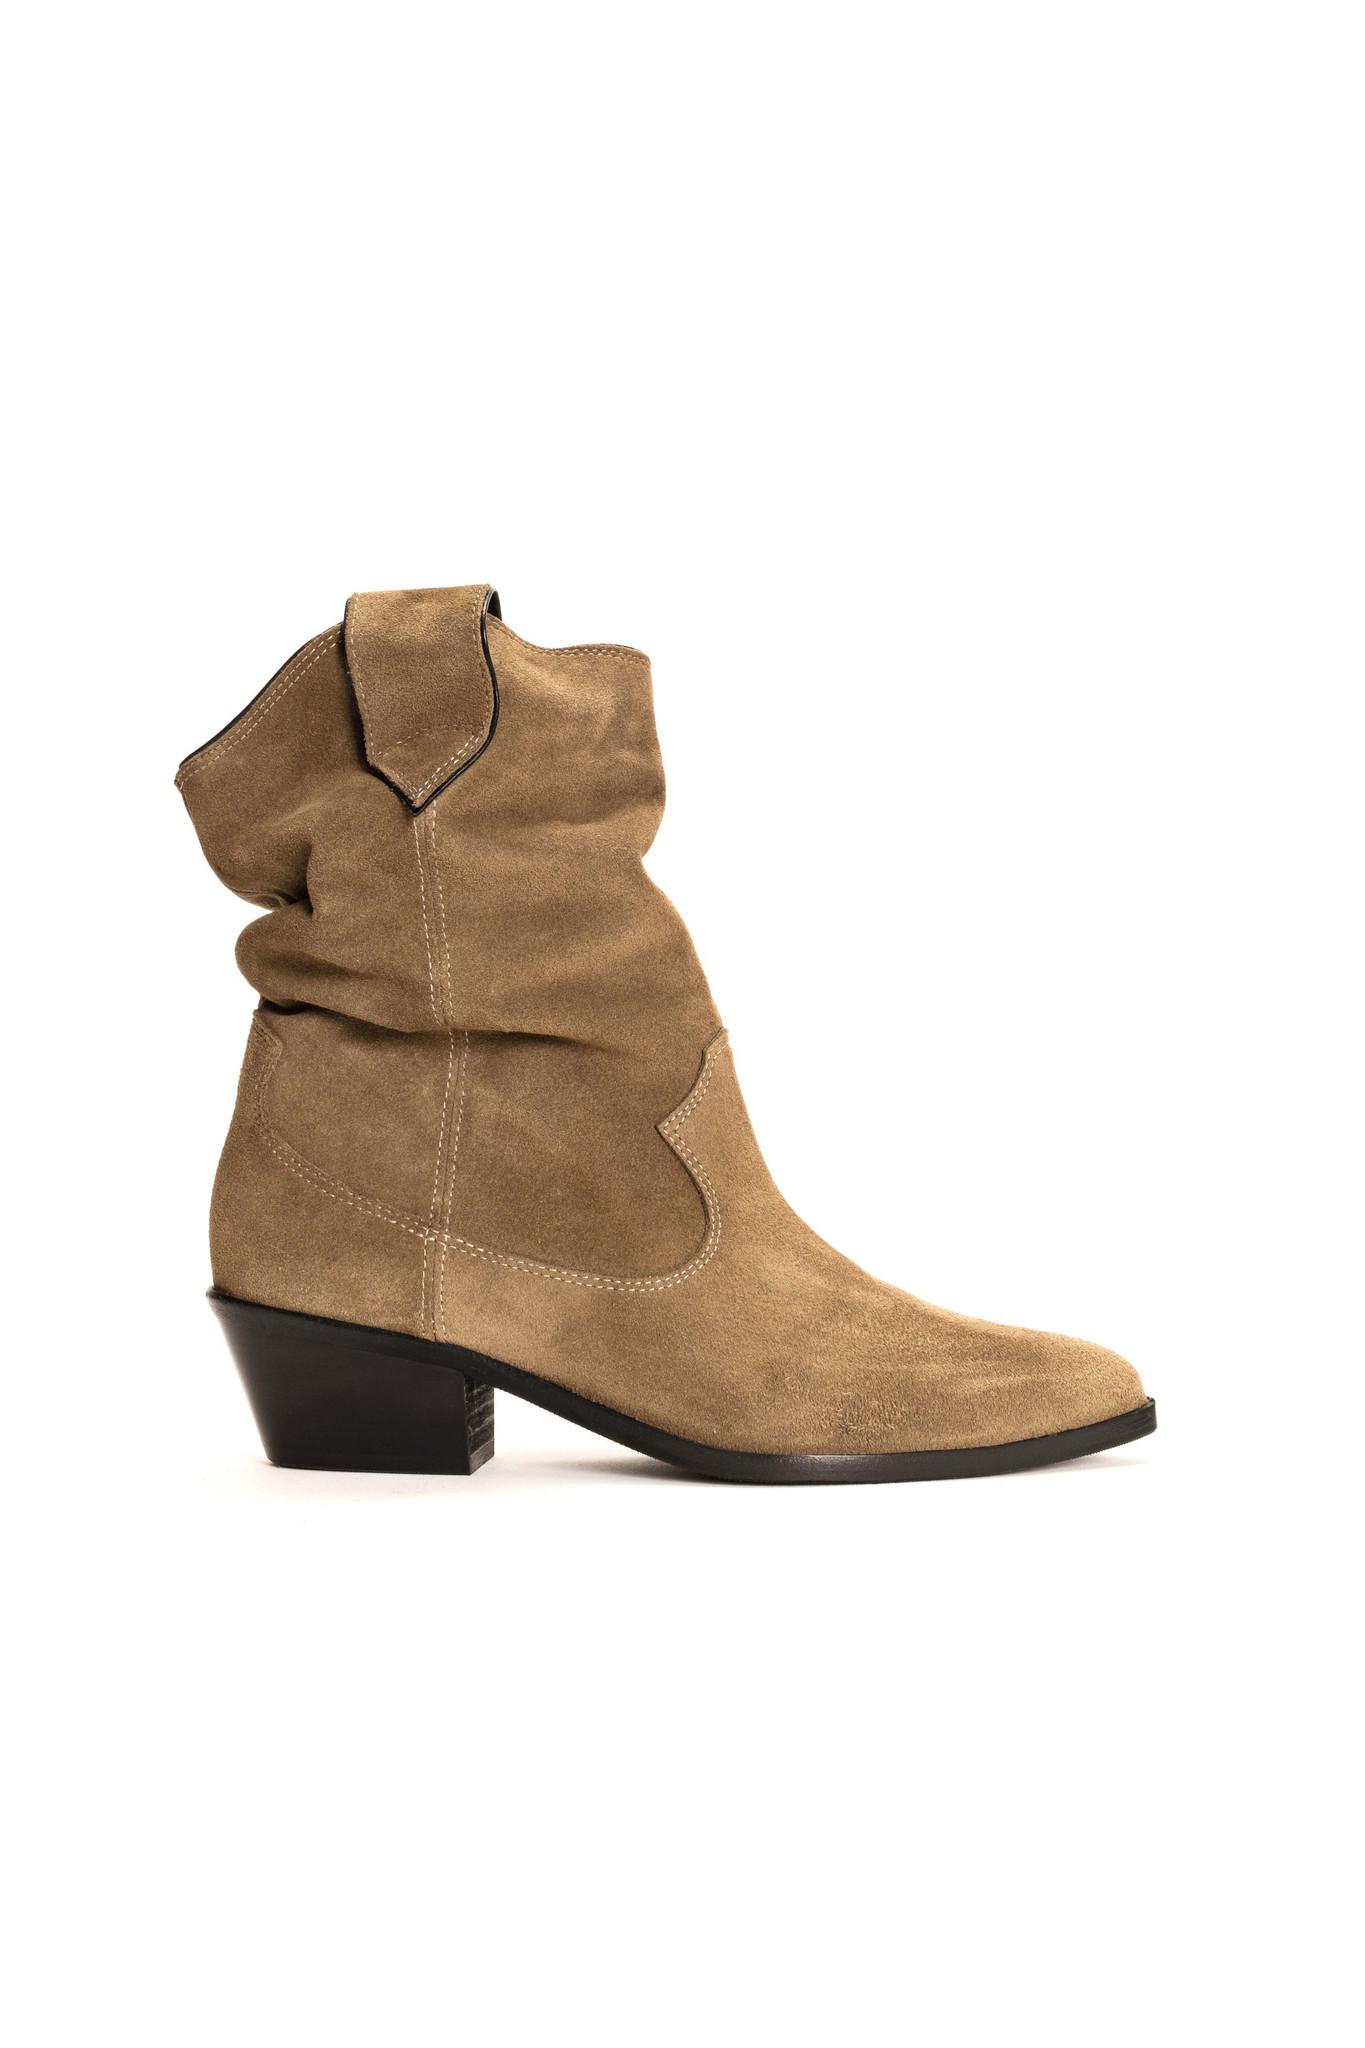 Saseline 35 Calf Suede Boot - Khaki-1